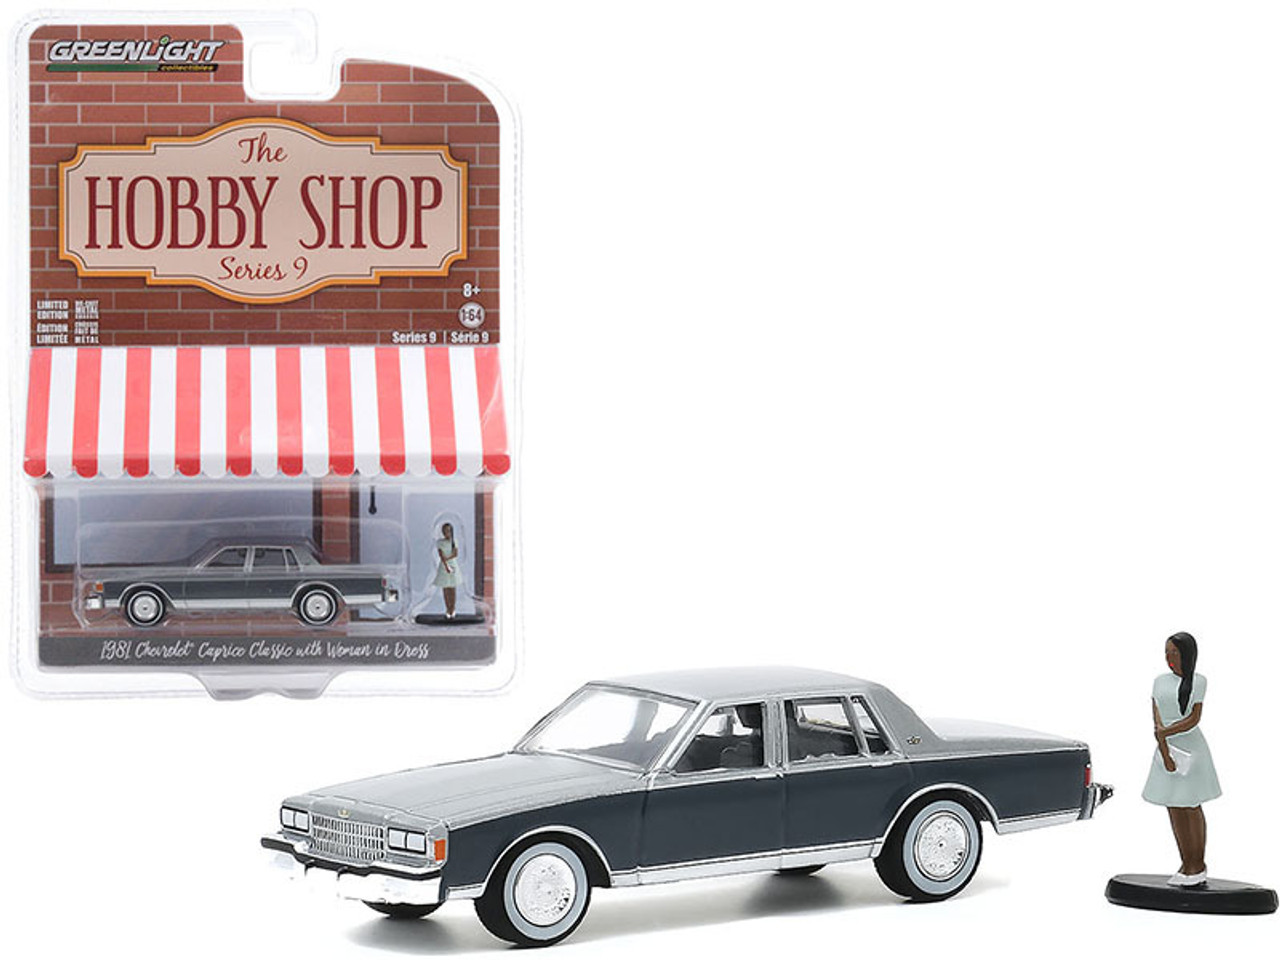 Greenlight Hobby Shop series 1981 Chevrolet Caprice Classic